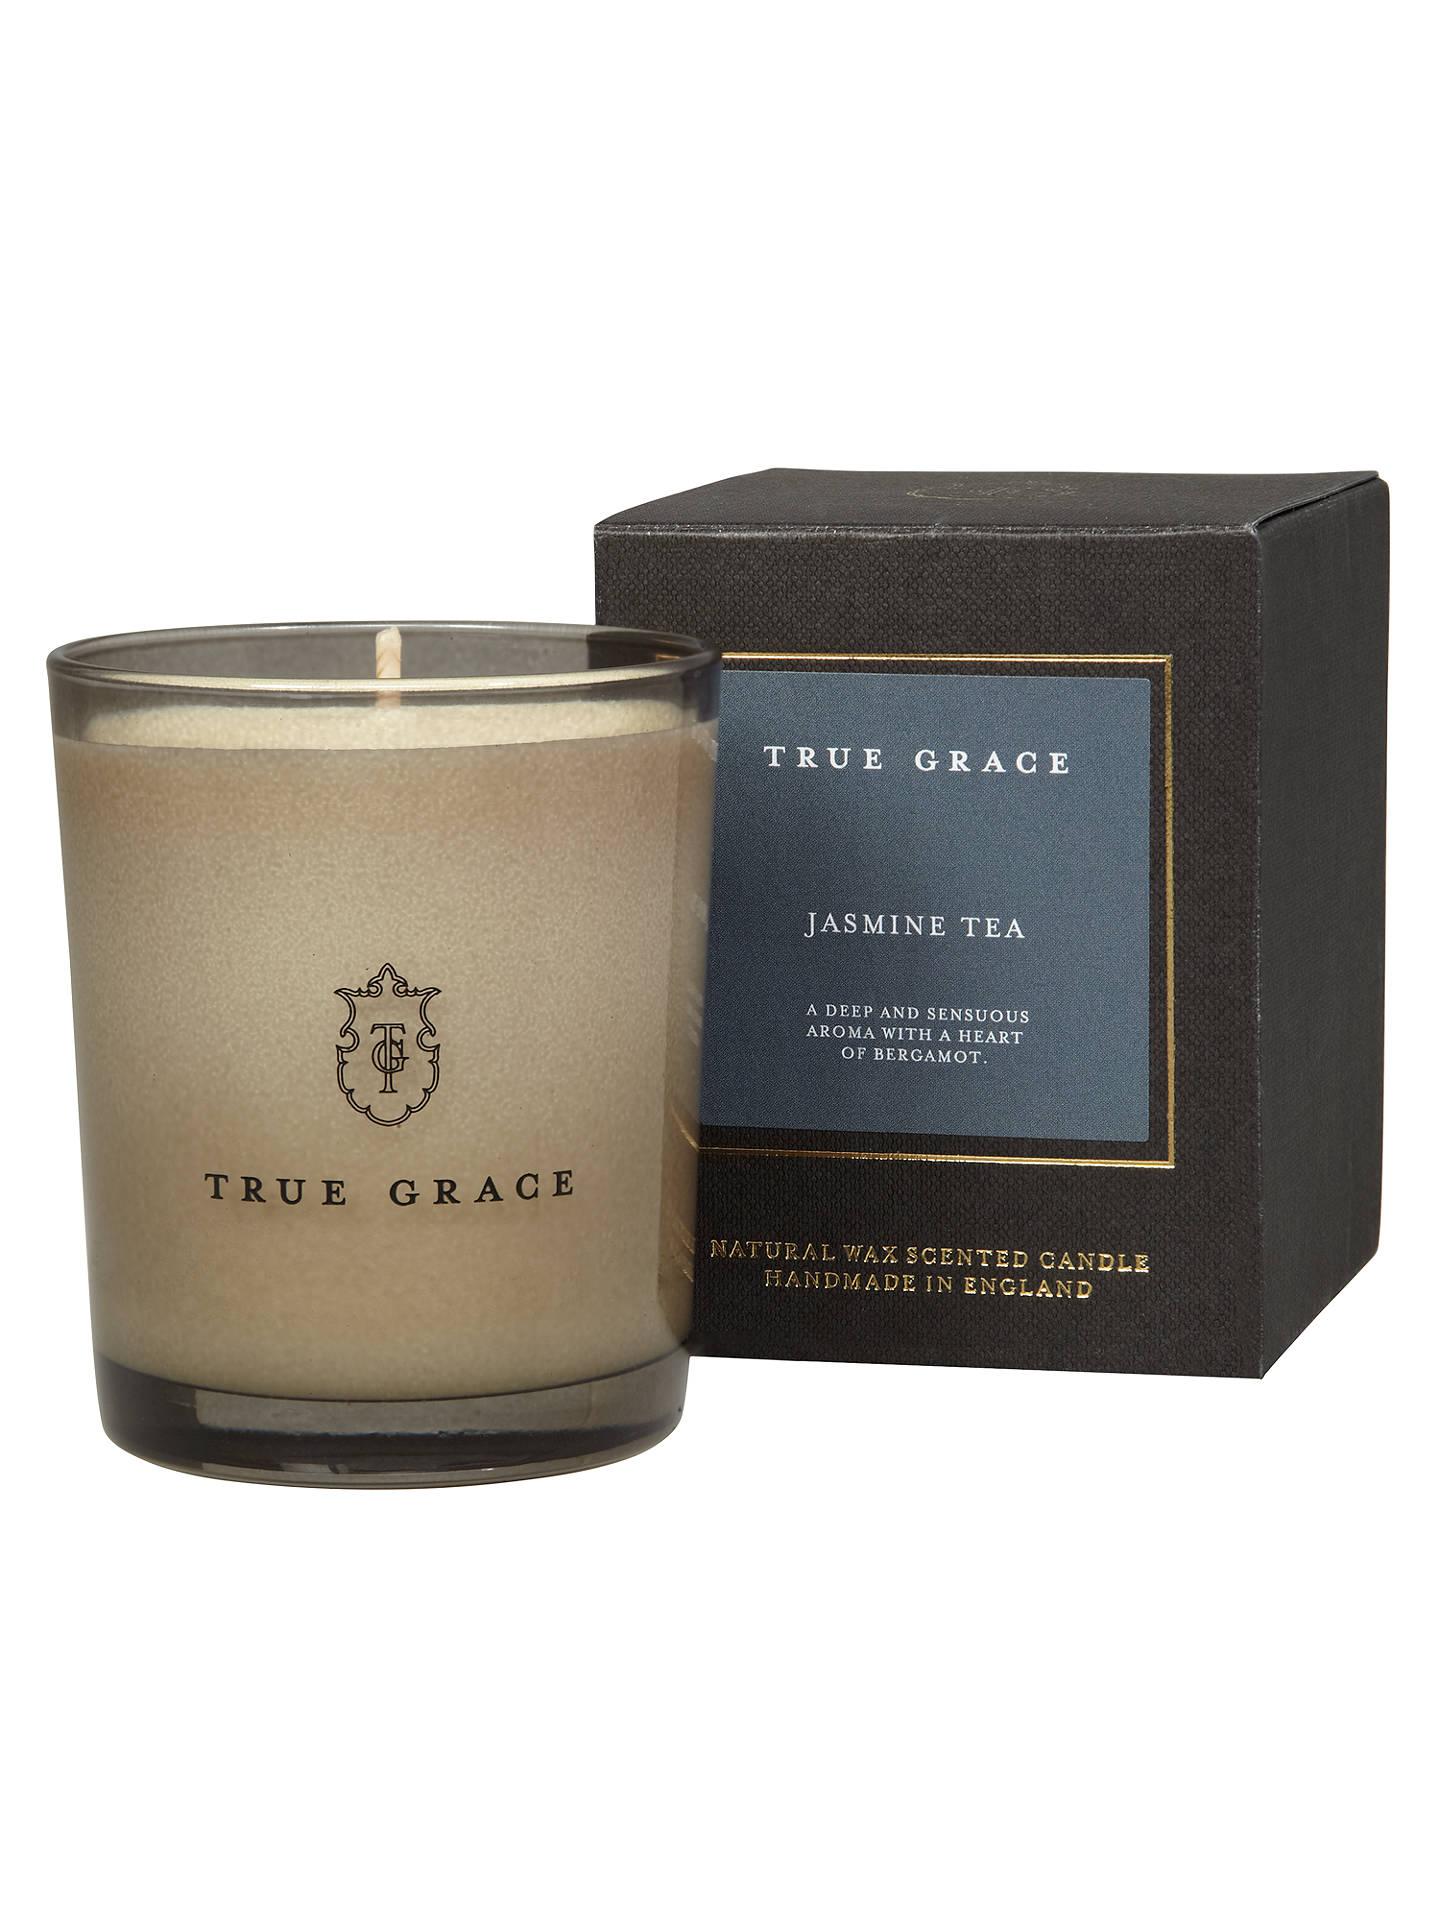 True Grace Jasmine Tea Scented Candle at John Lewis & Partners